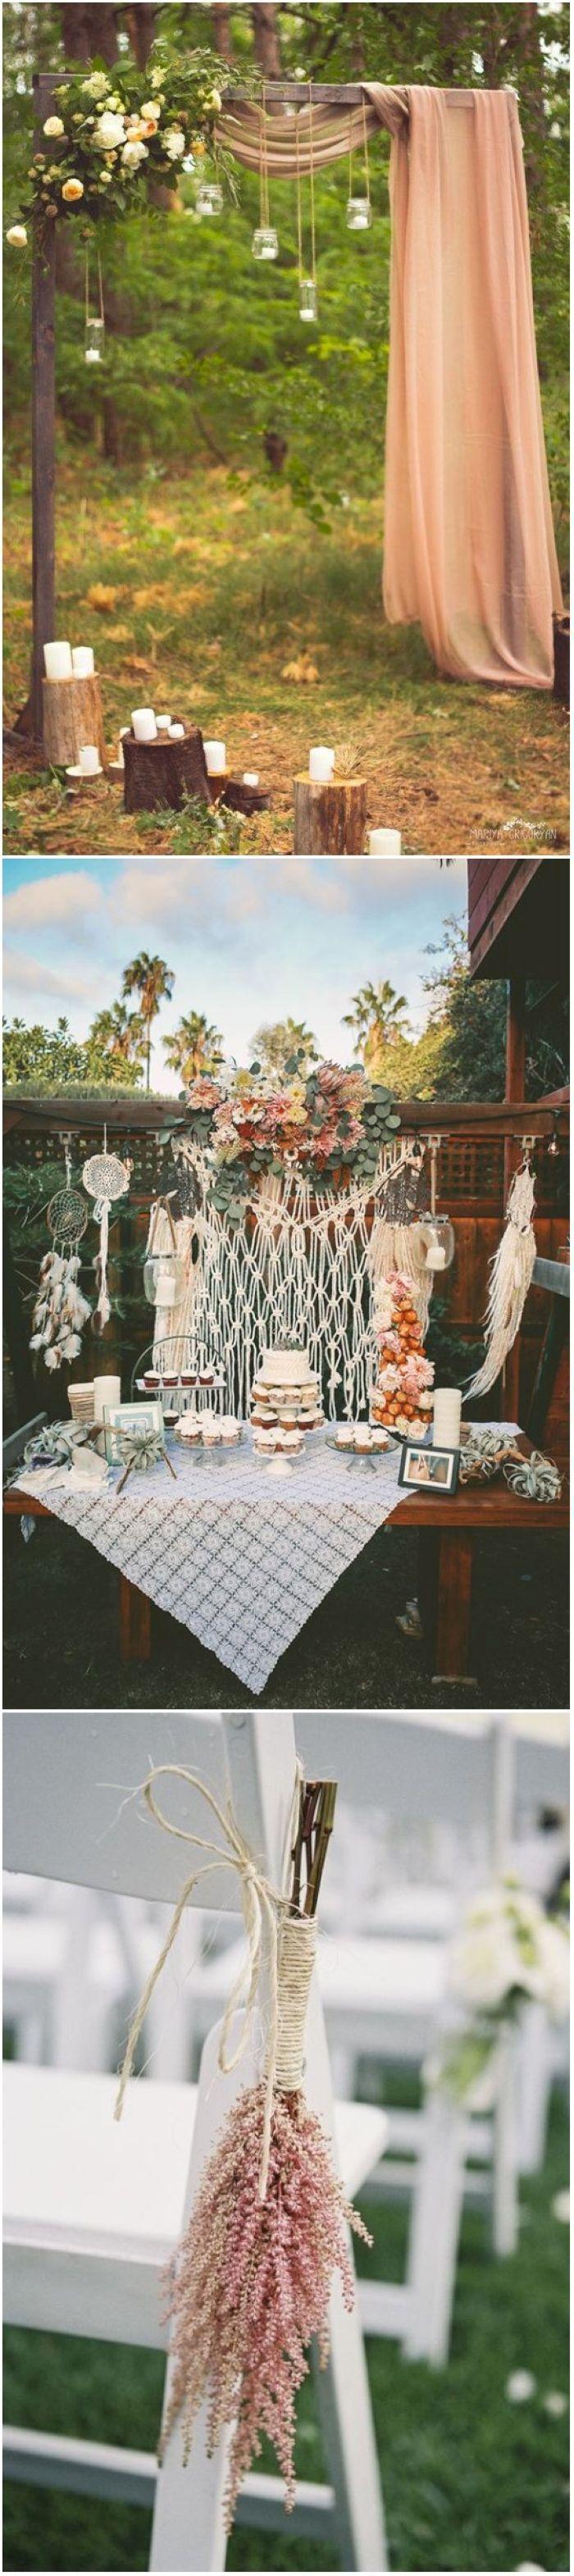 nice 71 Elegant Outdoor Wedding Decor Ideas on A Budget ...